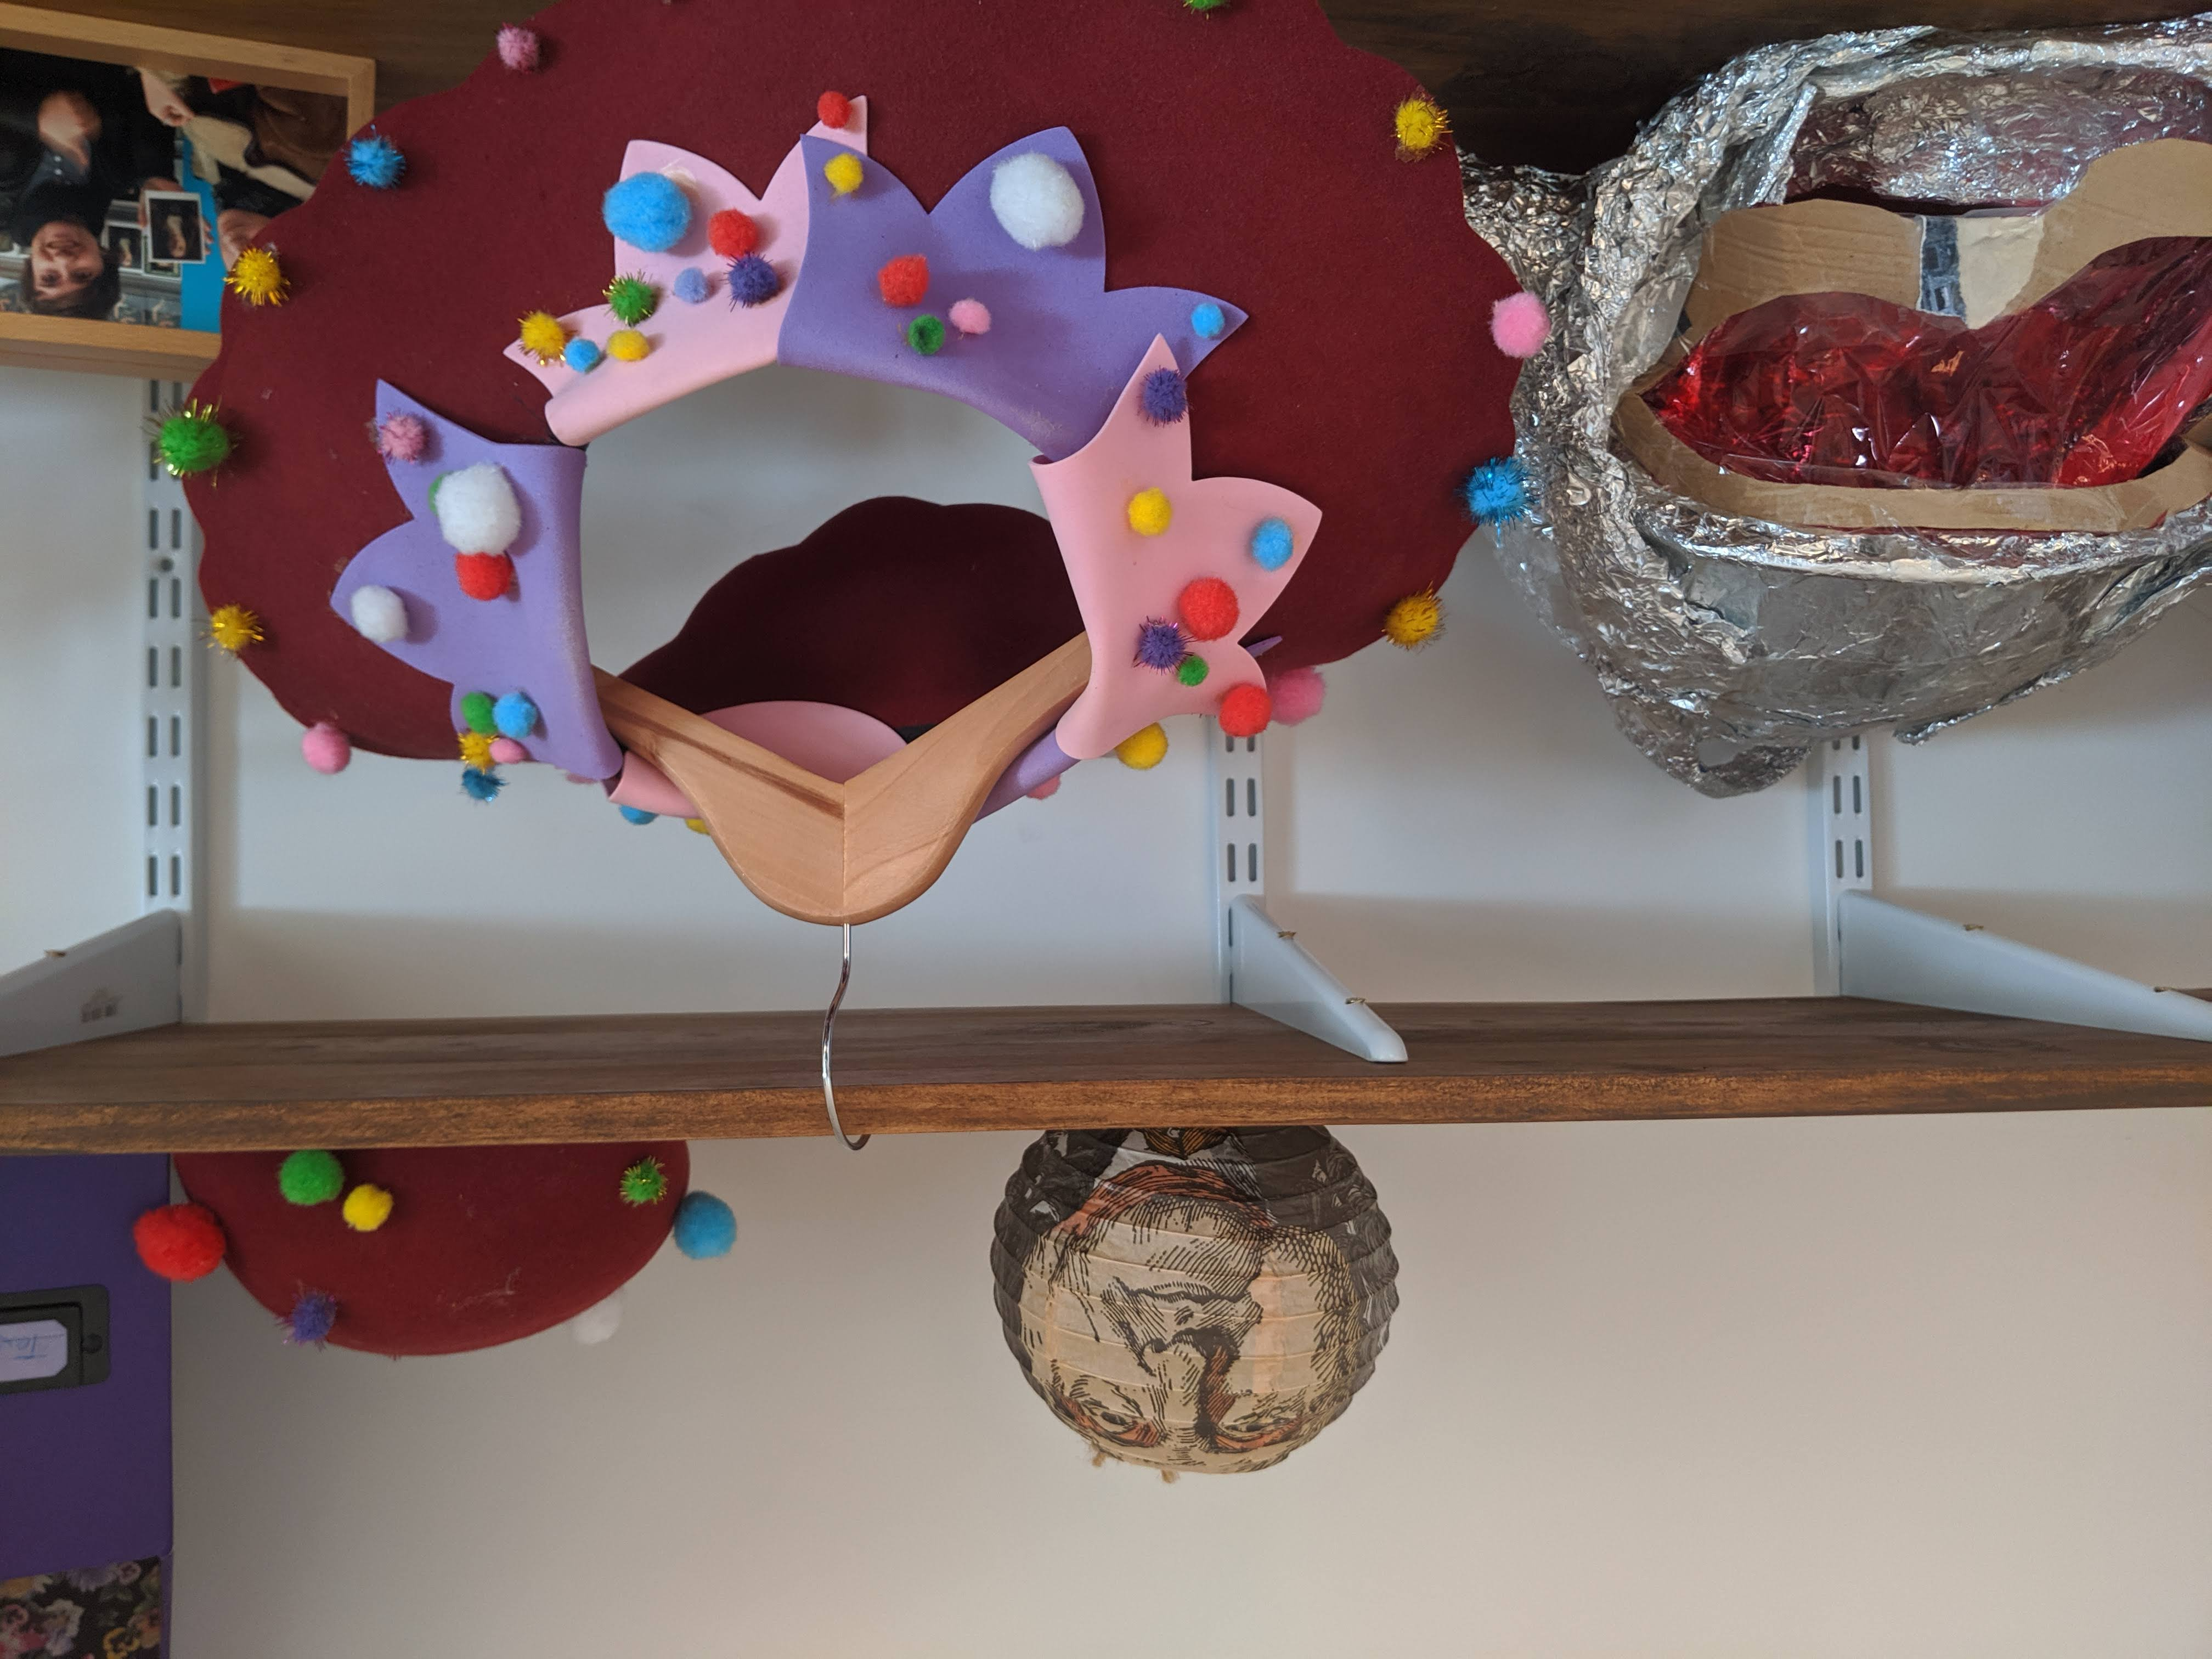 Photograph of clown paraphelania in Abi Palmer's flat